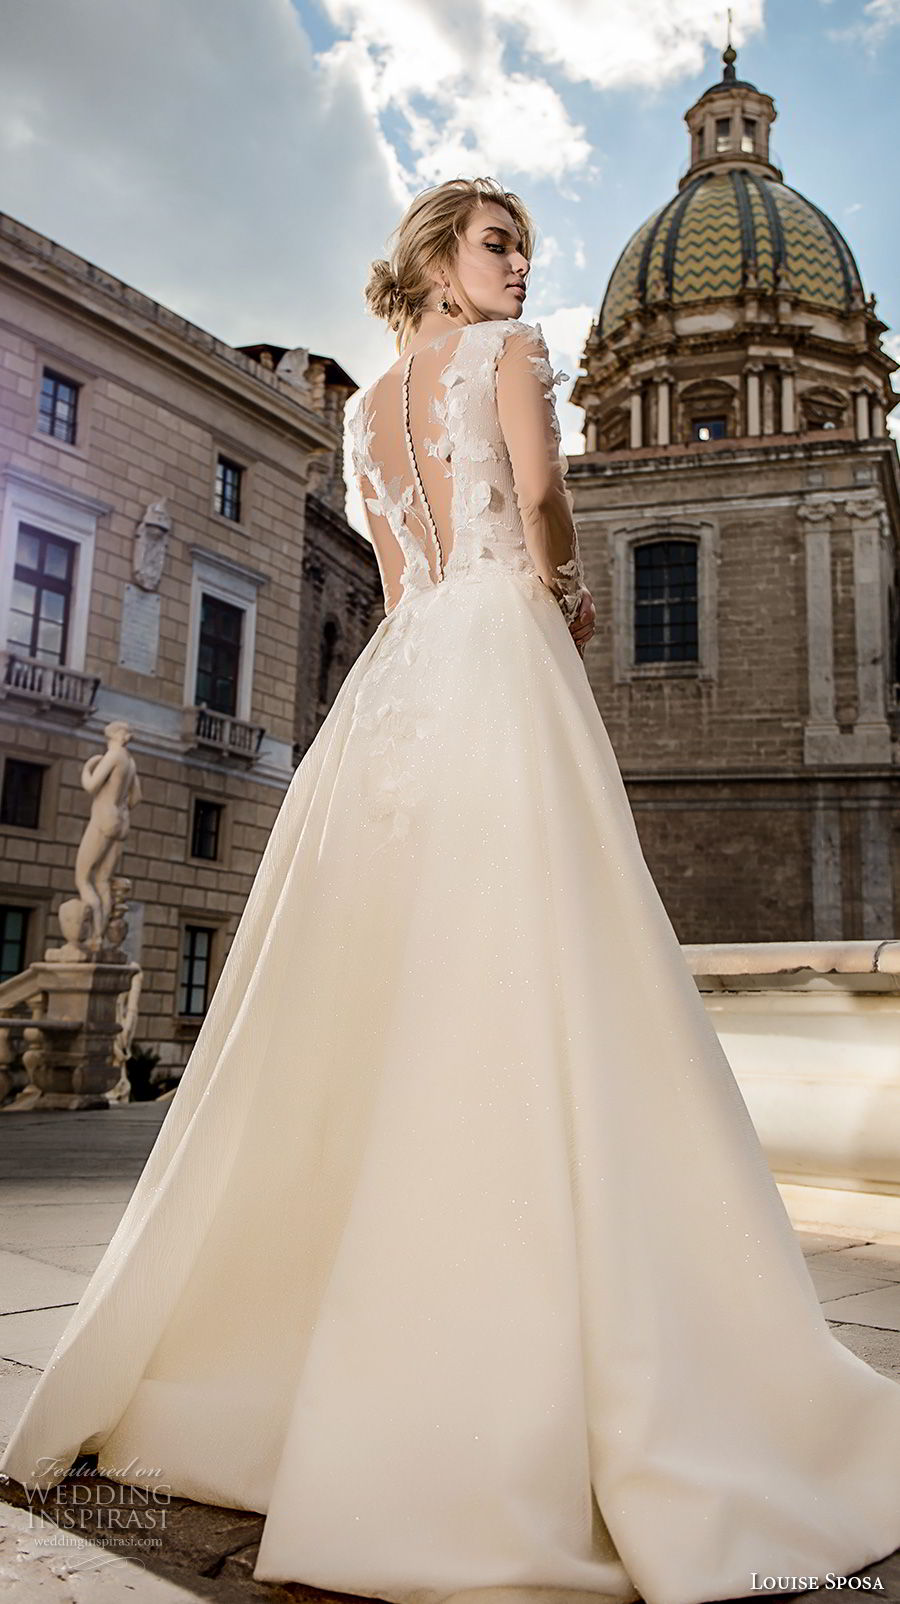 Louise Sposa 2018 Bridal Long Sleeves V Neck Heavily Embellished Bodice Elegant A Line Wedding Dress